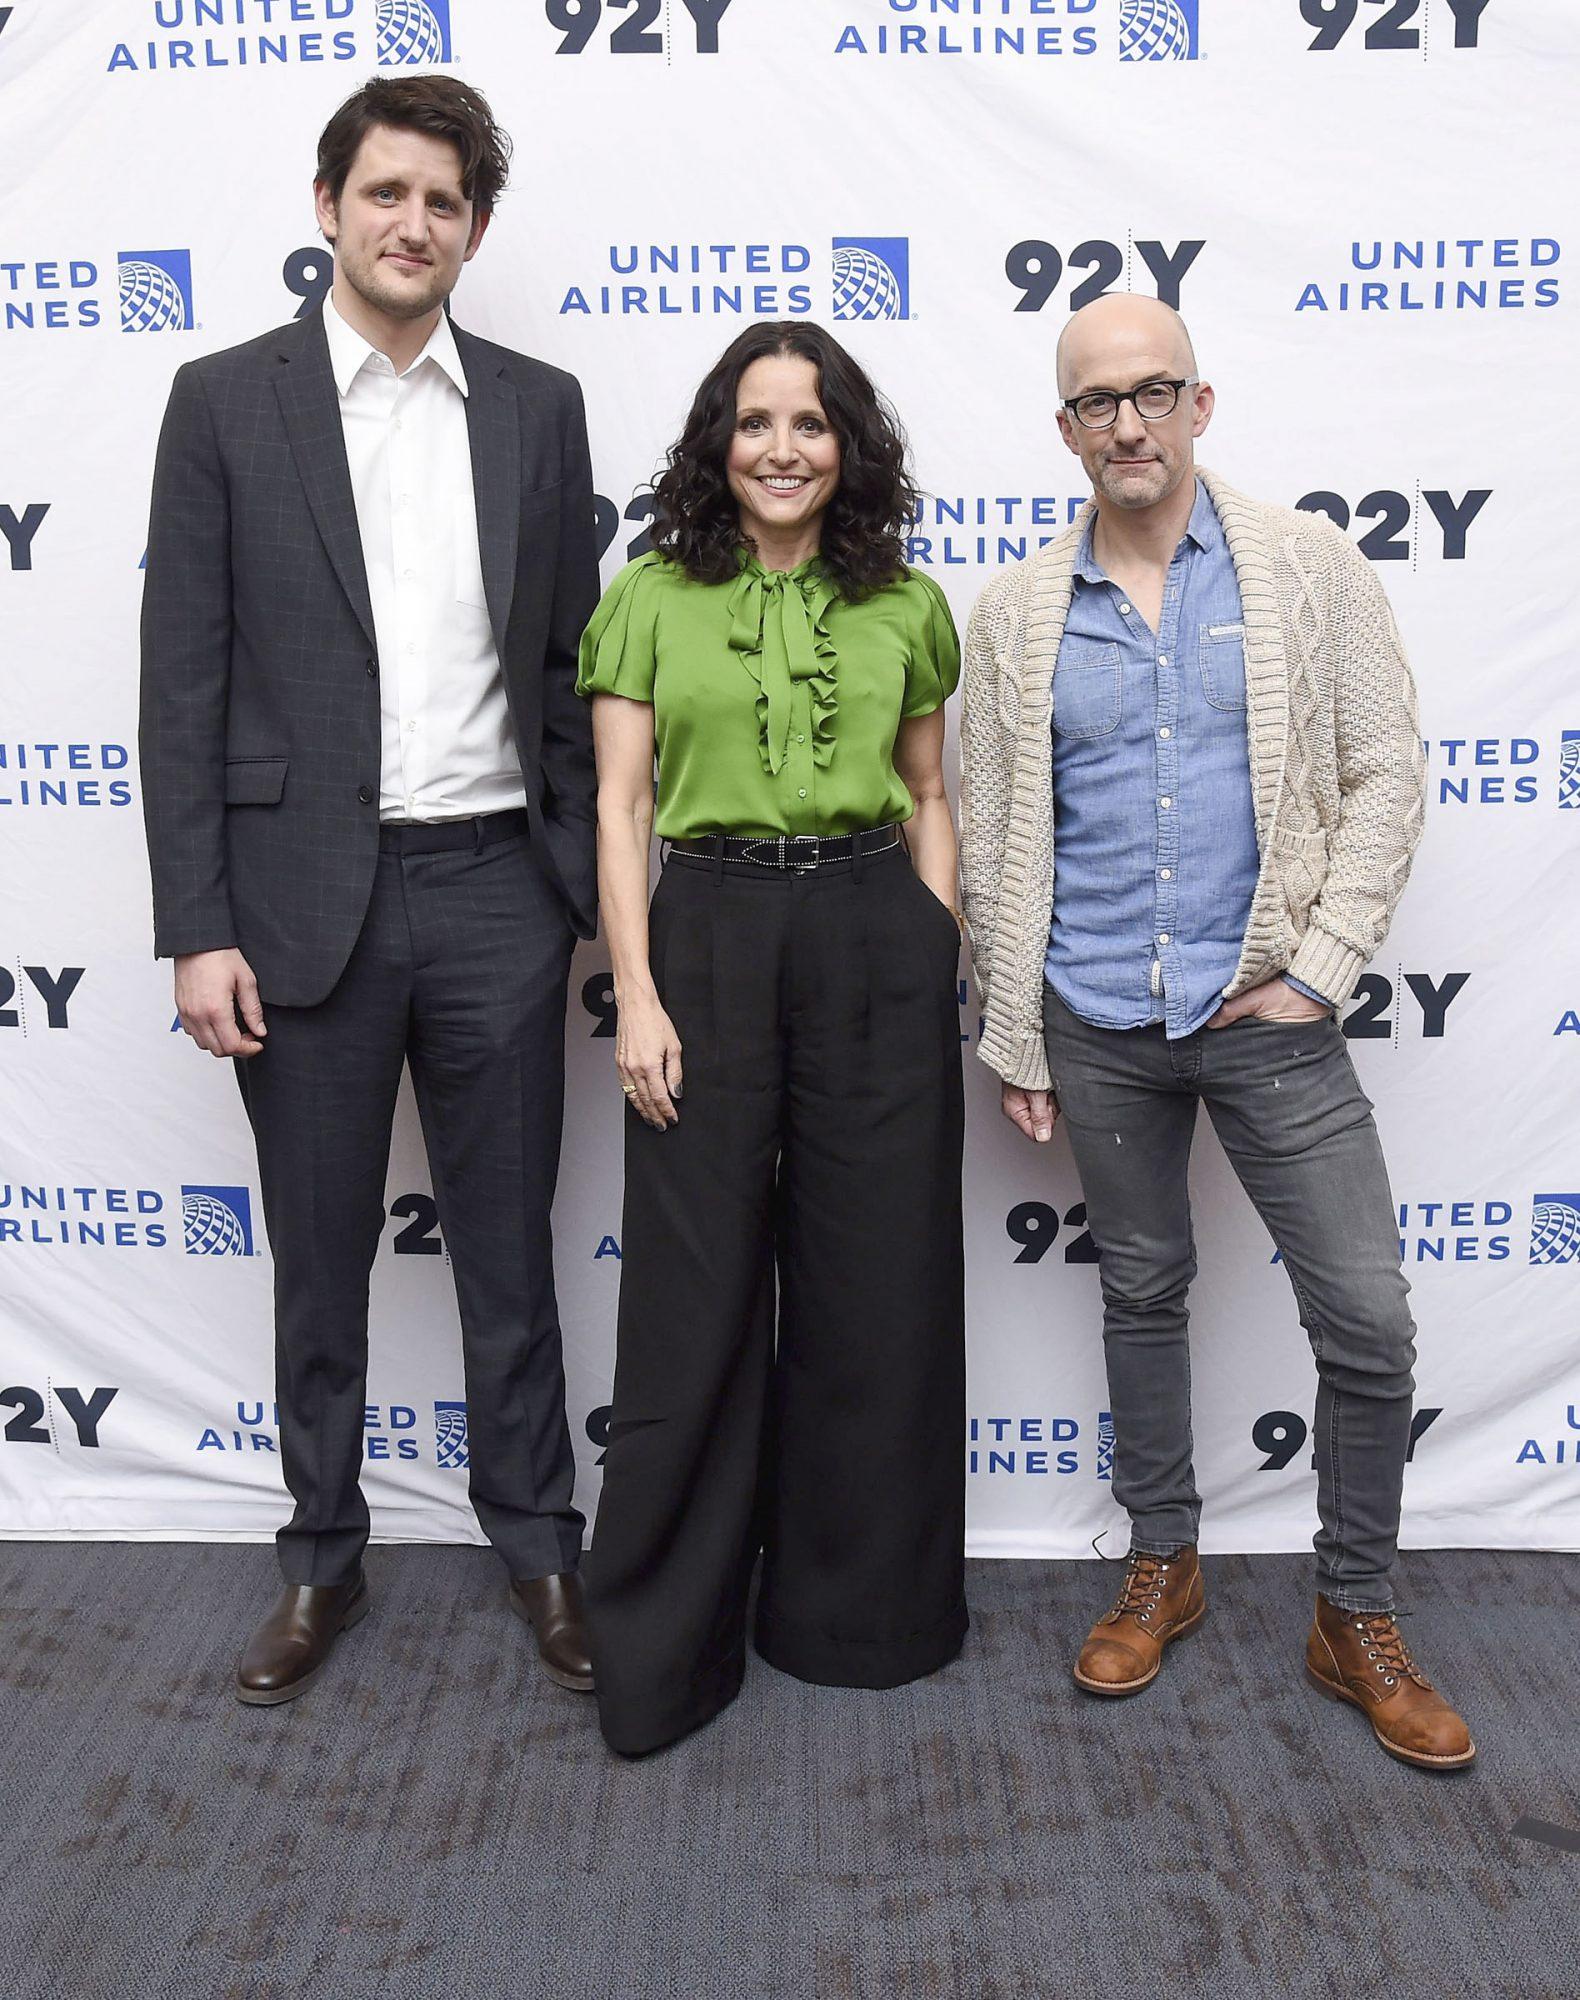 Zach Woods, Julia Louis-Dreyfus and co-director Jim Rash